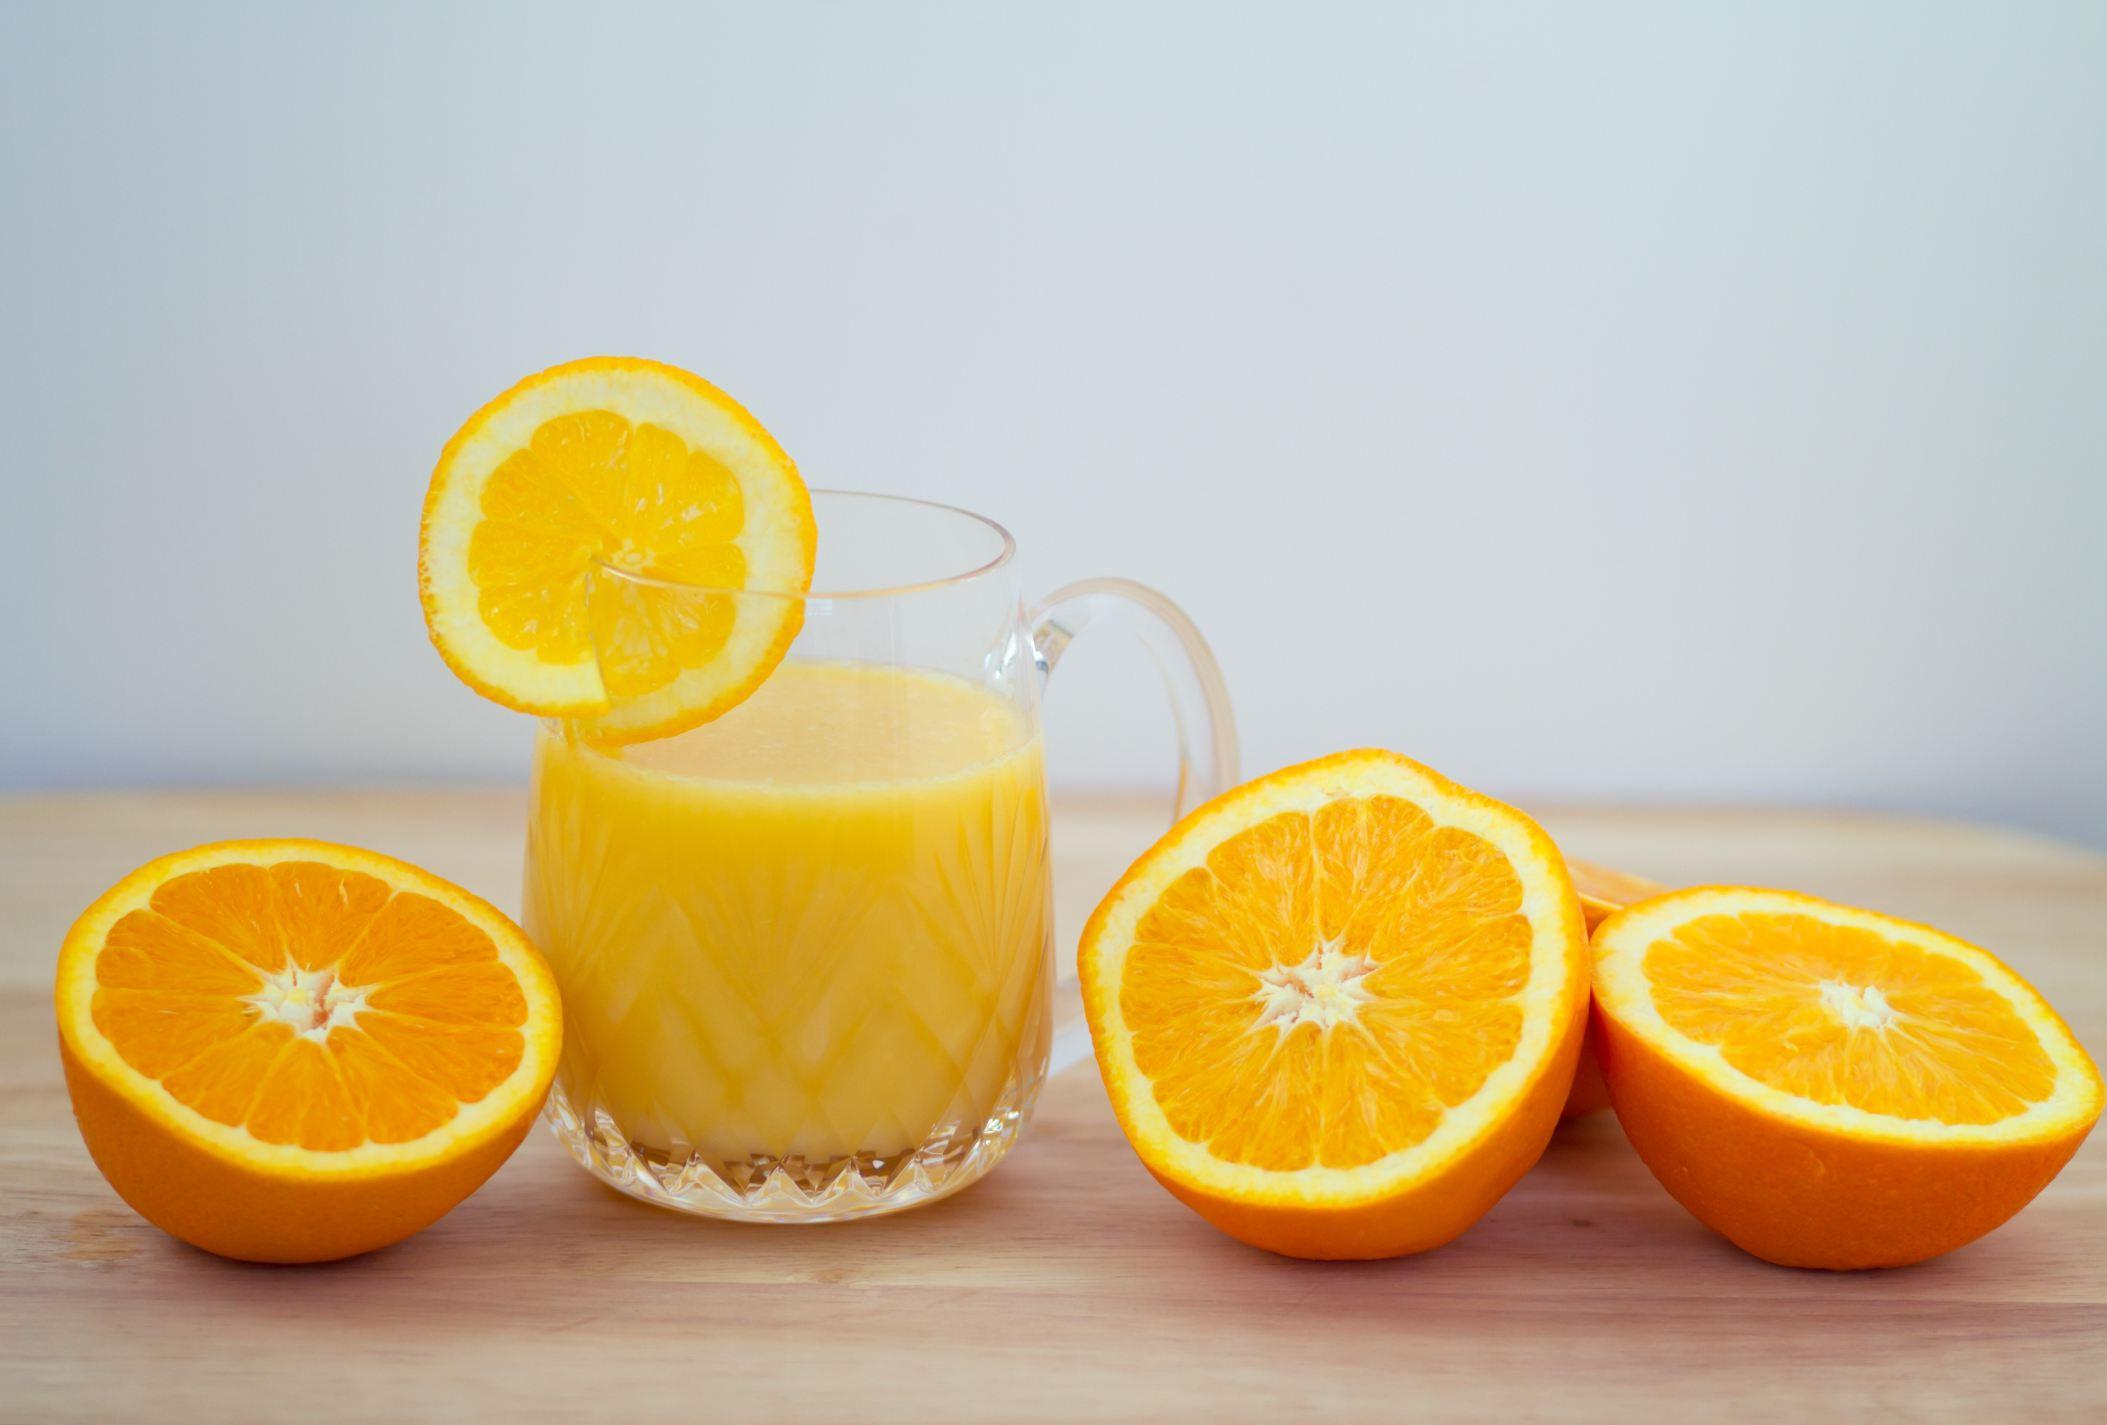 Oranges And Juice Are High In Vitamin C